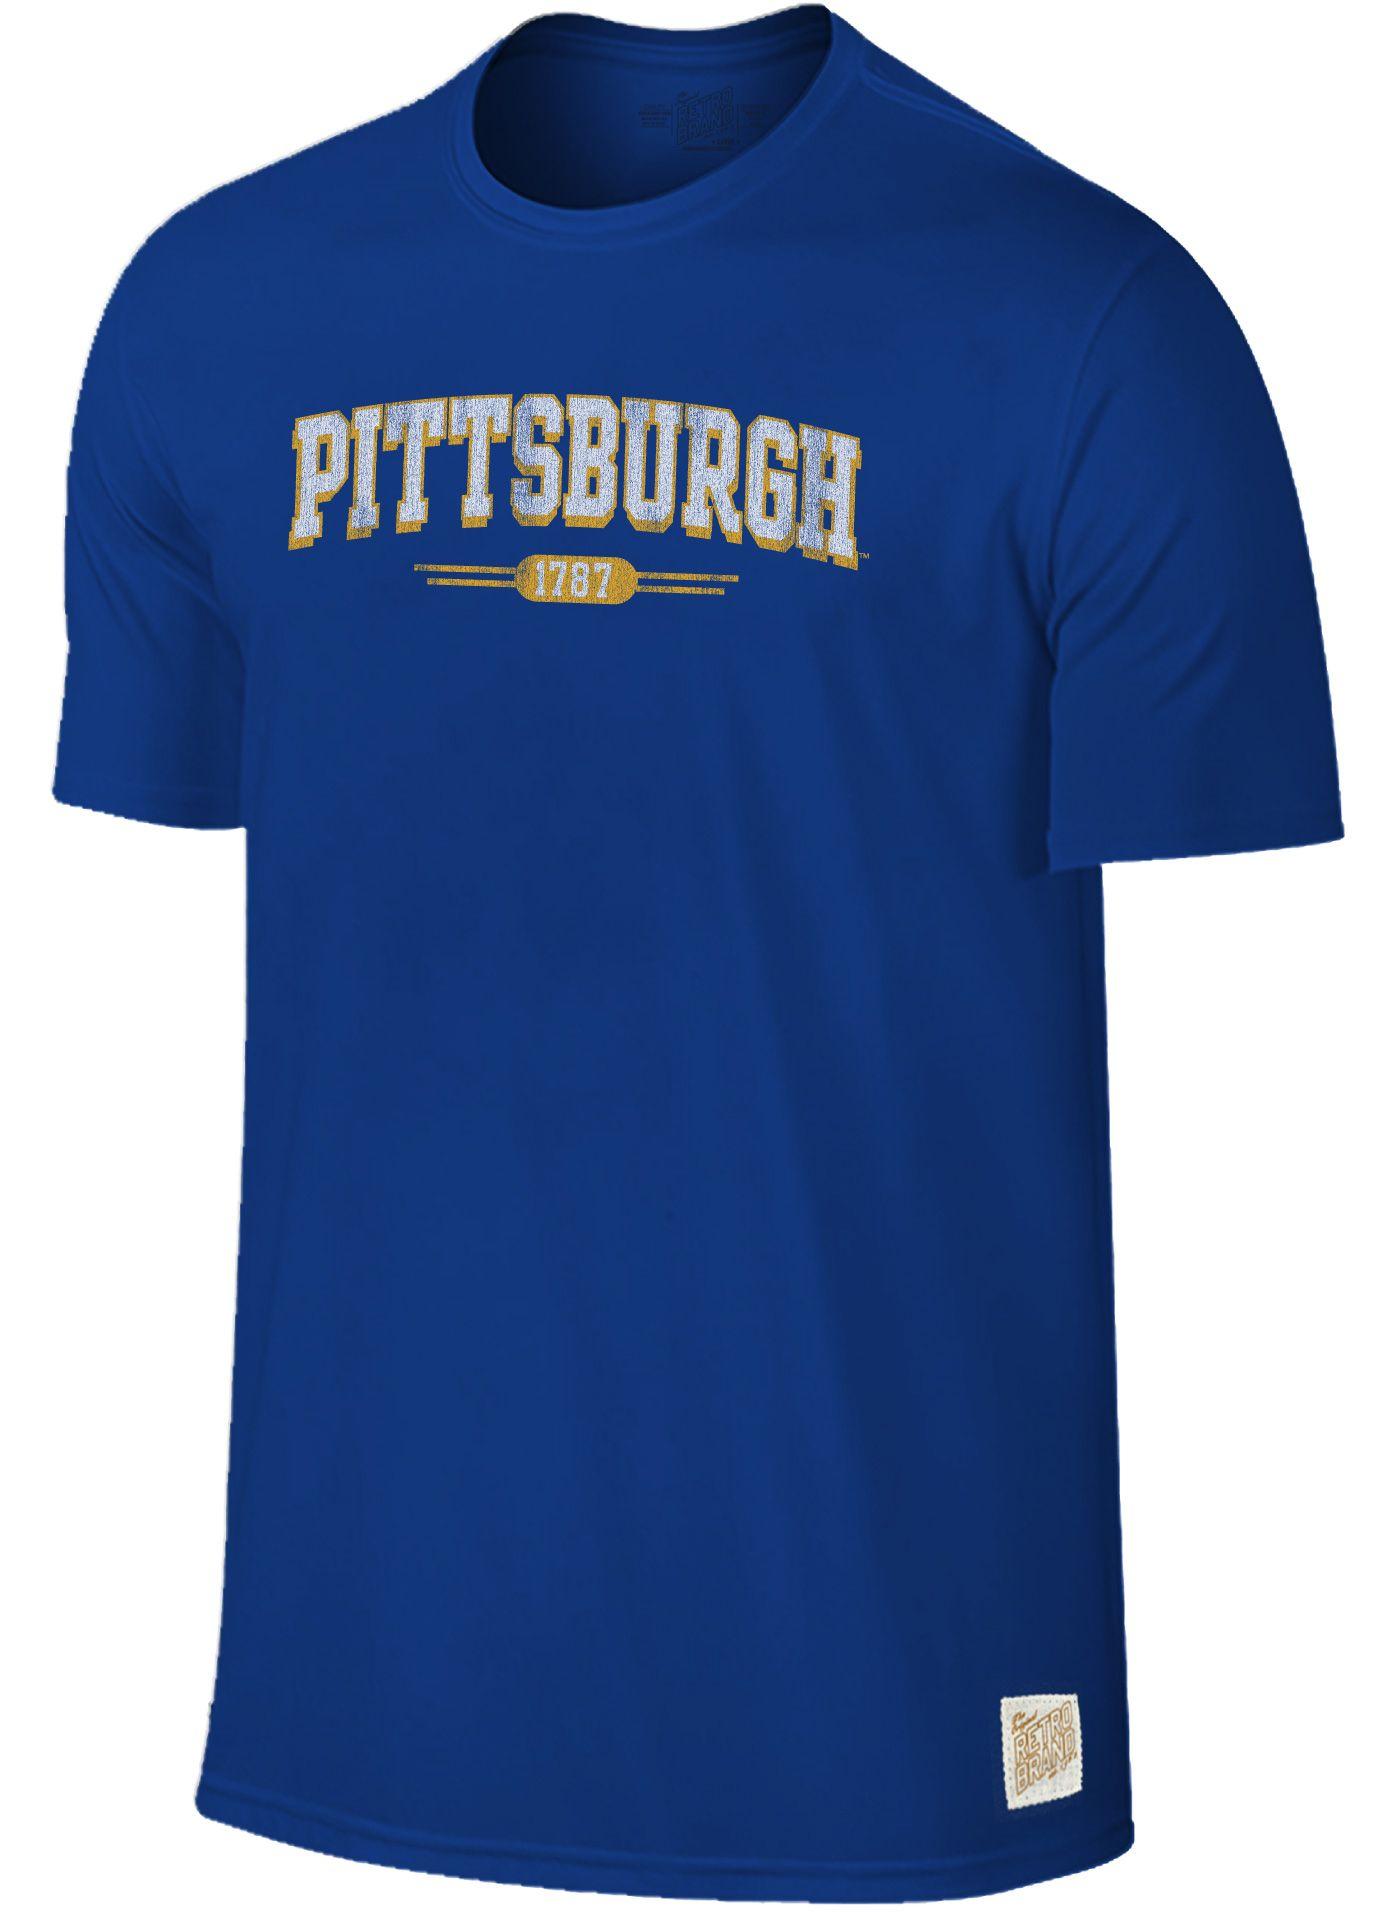 Original Retro Brand Men's Pitt Panthers Blue Slub T-Shirt